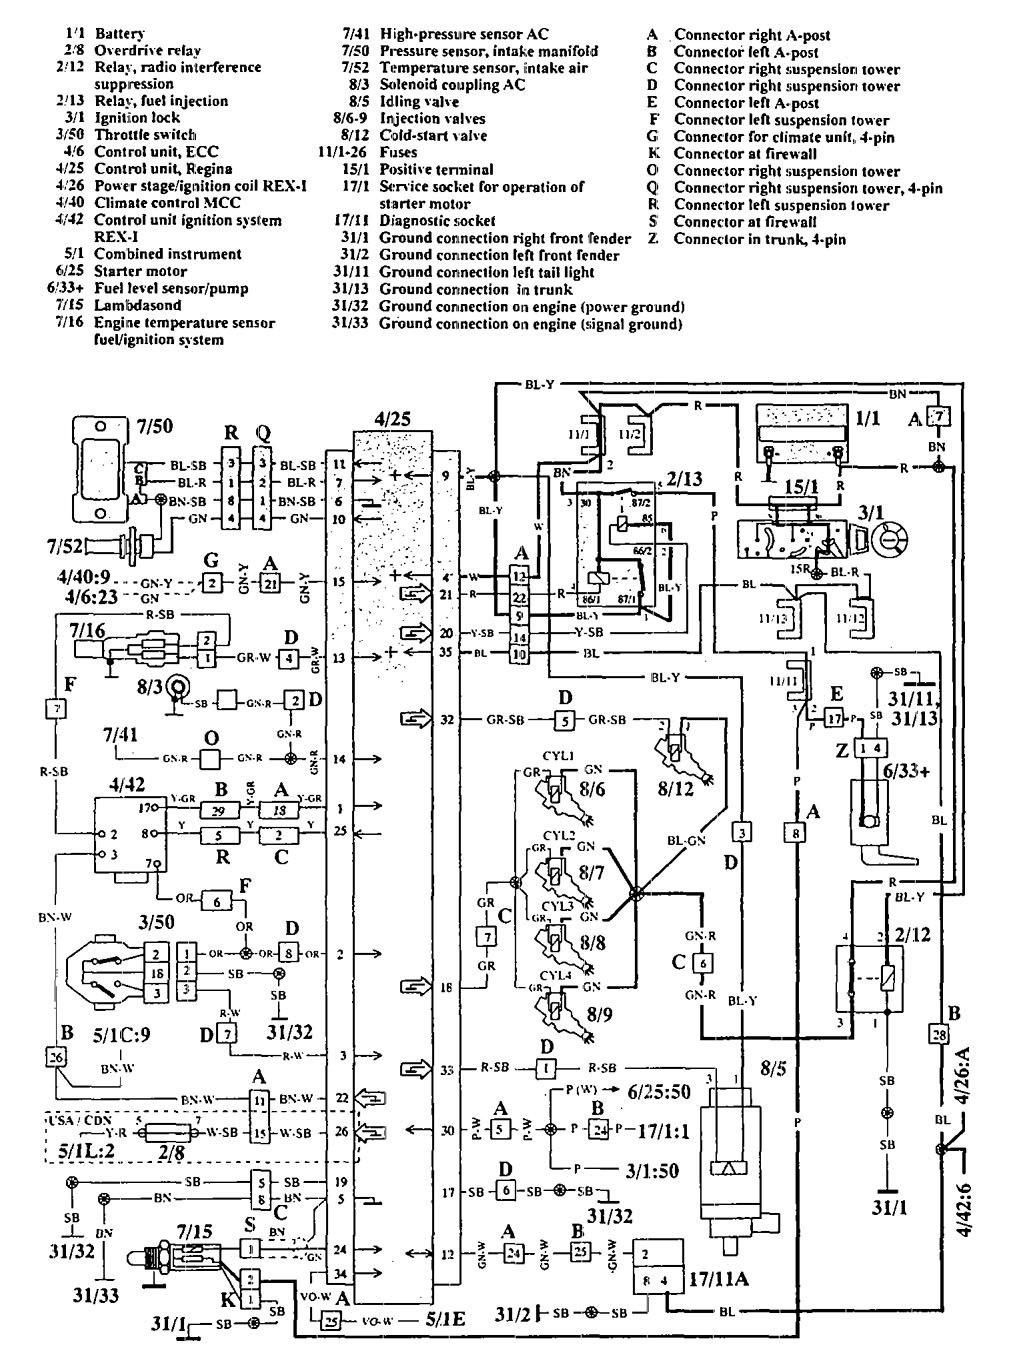 [TBQL_4184]  ZC_2933] Volvo 940 Wiring Diagram Download Diagram | 1992 Volvo 940 Wiring Diagram |  | Eumqu Embo Vish Ungo Sapebe Mohammedshrine Librar Wiring 101